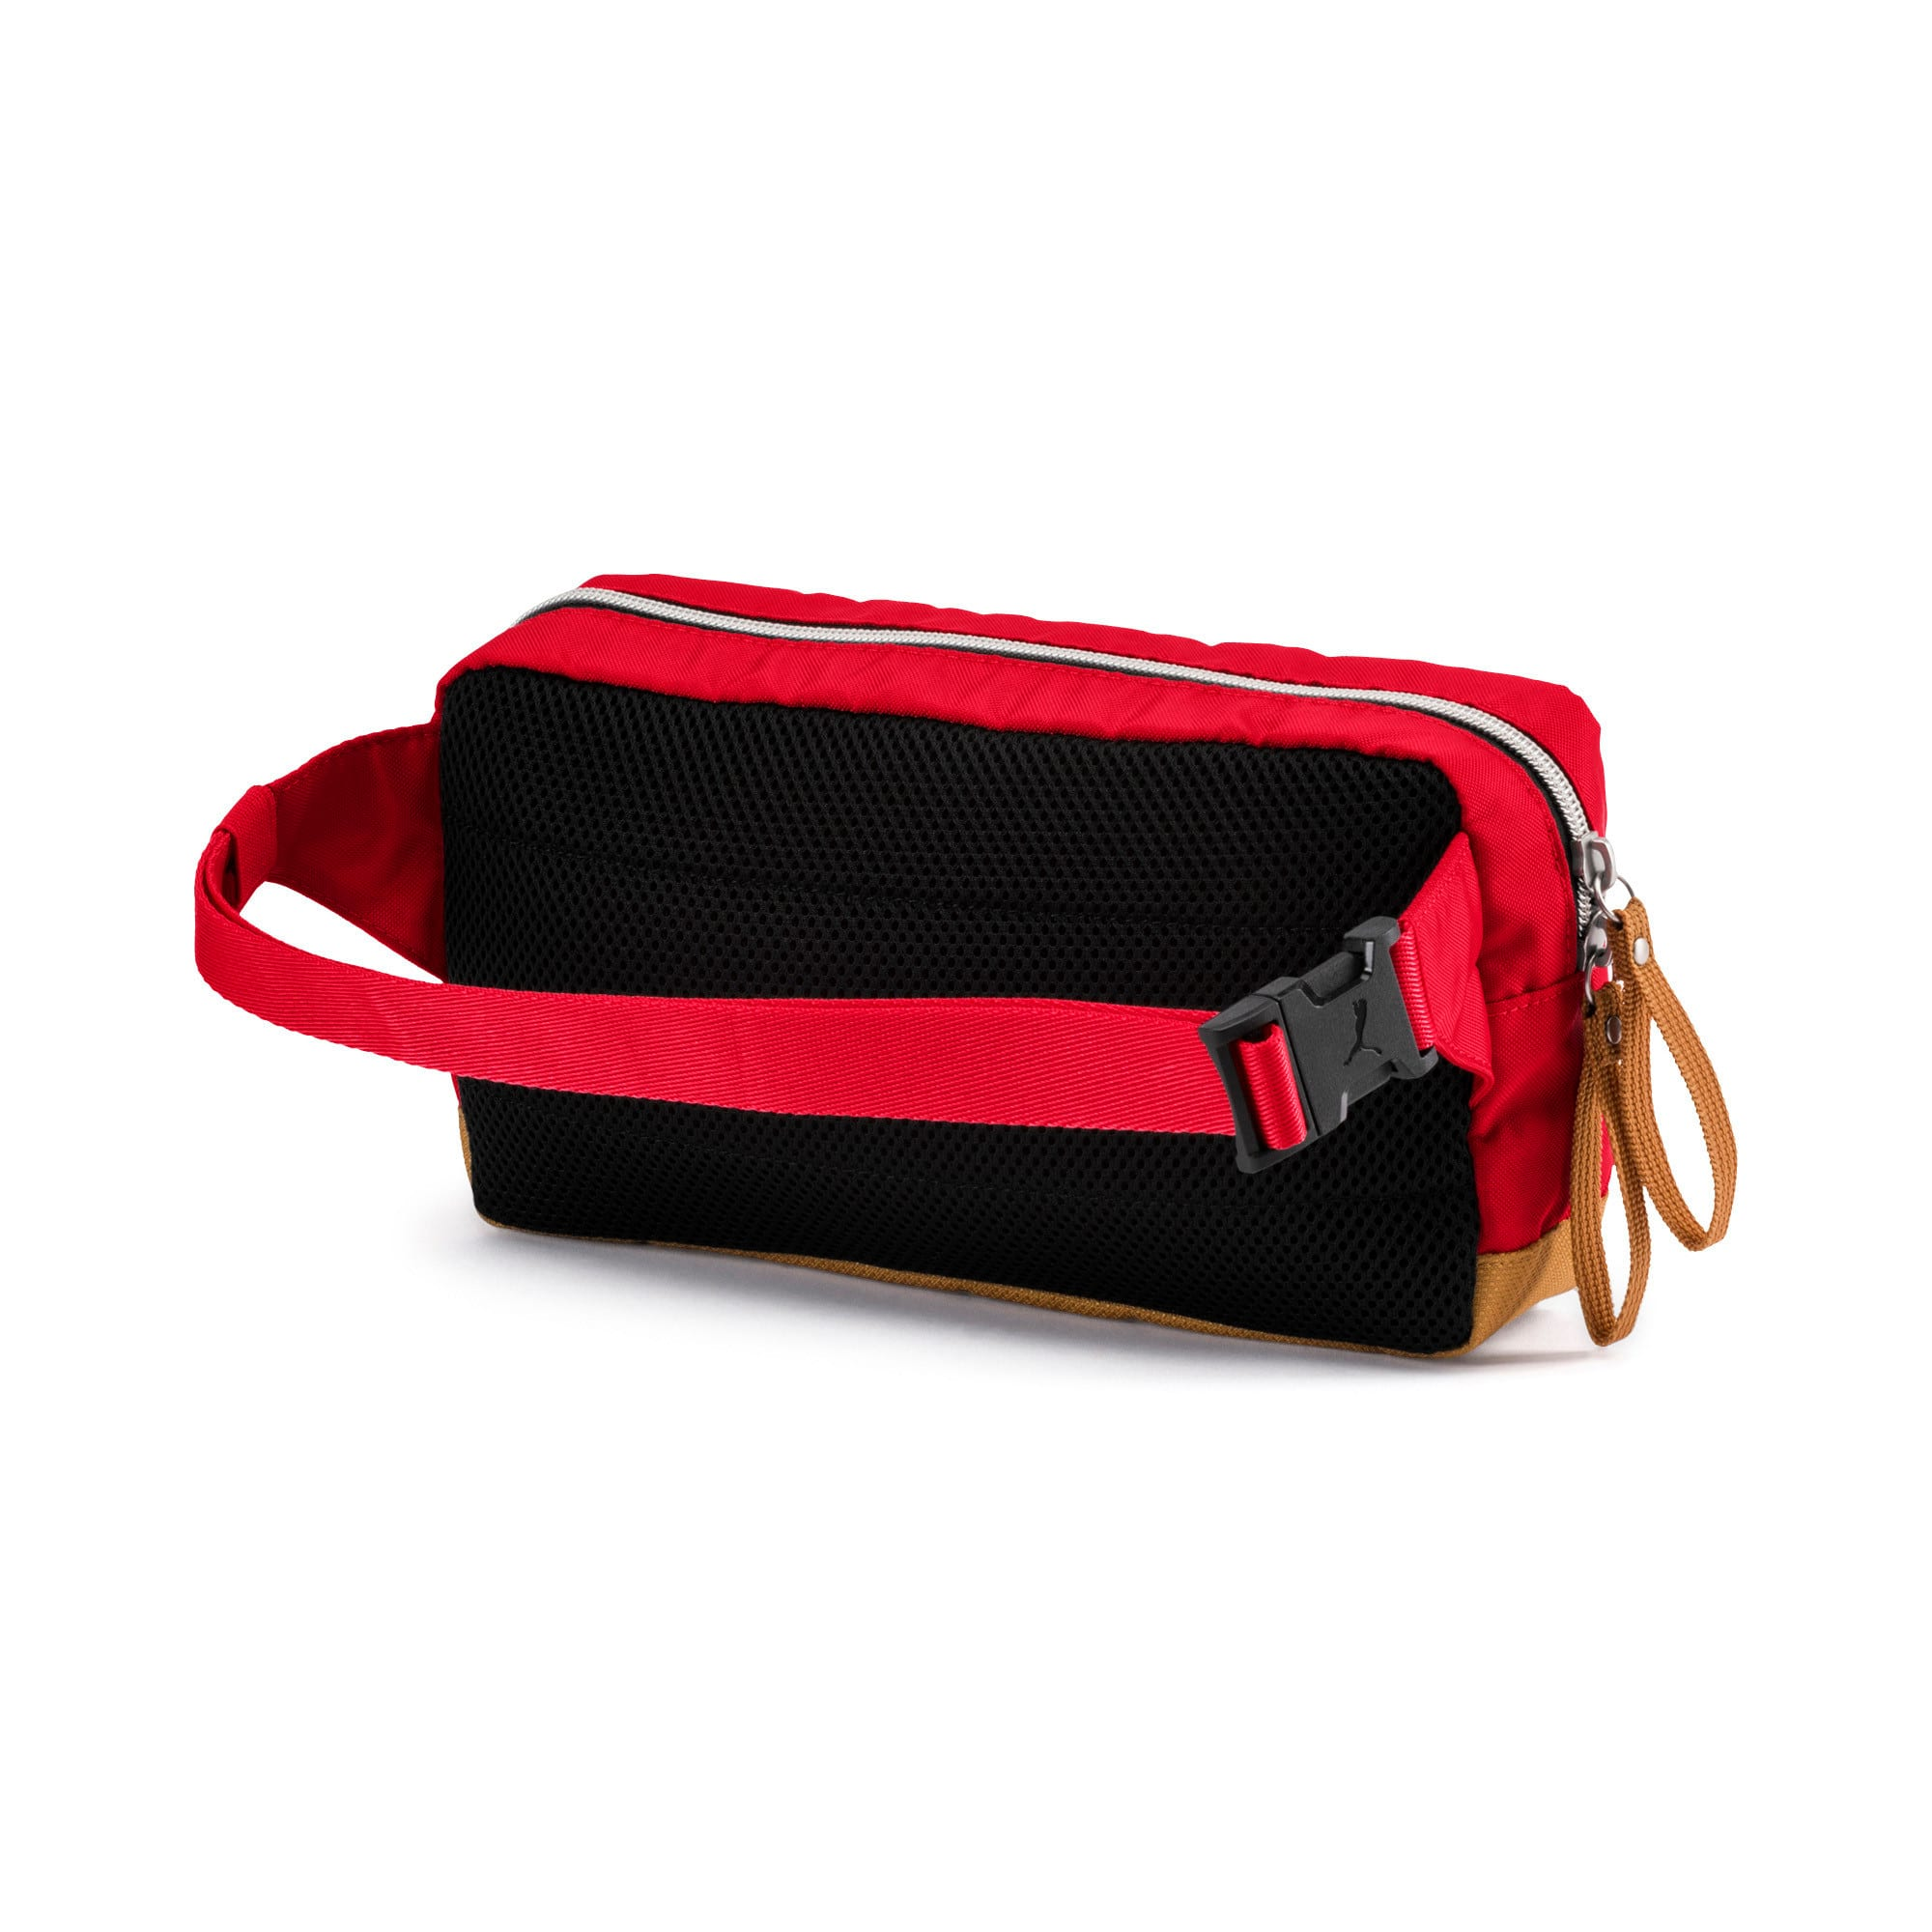 Thumbnail 2 of Scuderia Ferrari Fanwear Waist Bag, rosso corsa-Puma Black, medium